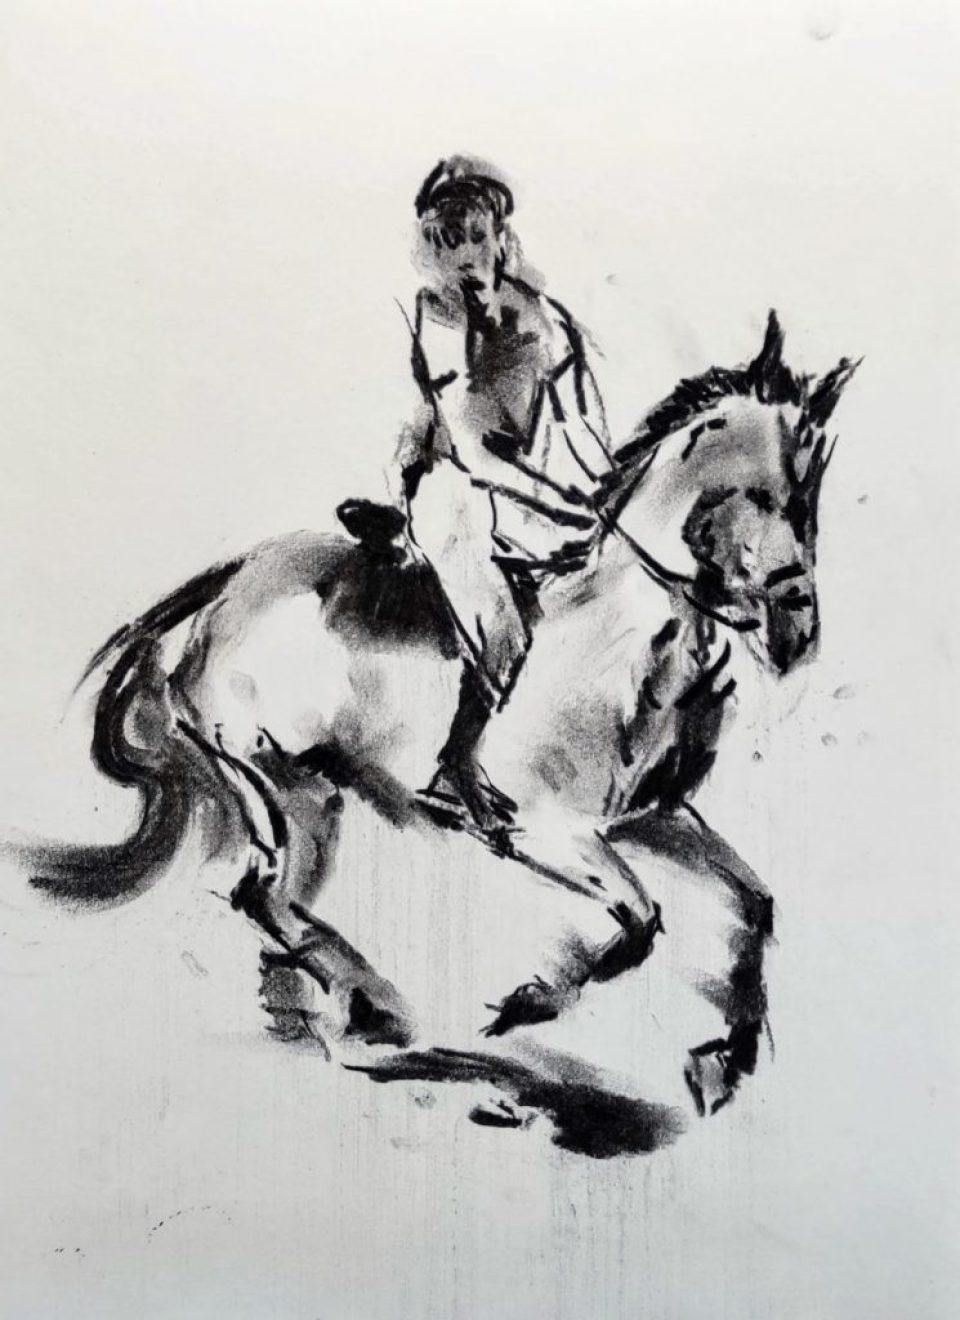 《騎馬》碳支 29cm x 36cm 5-12-2020